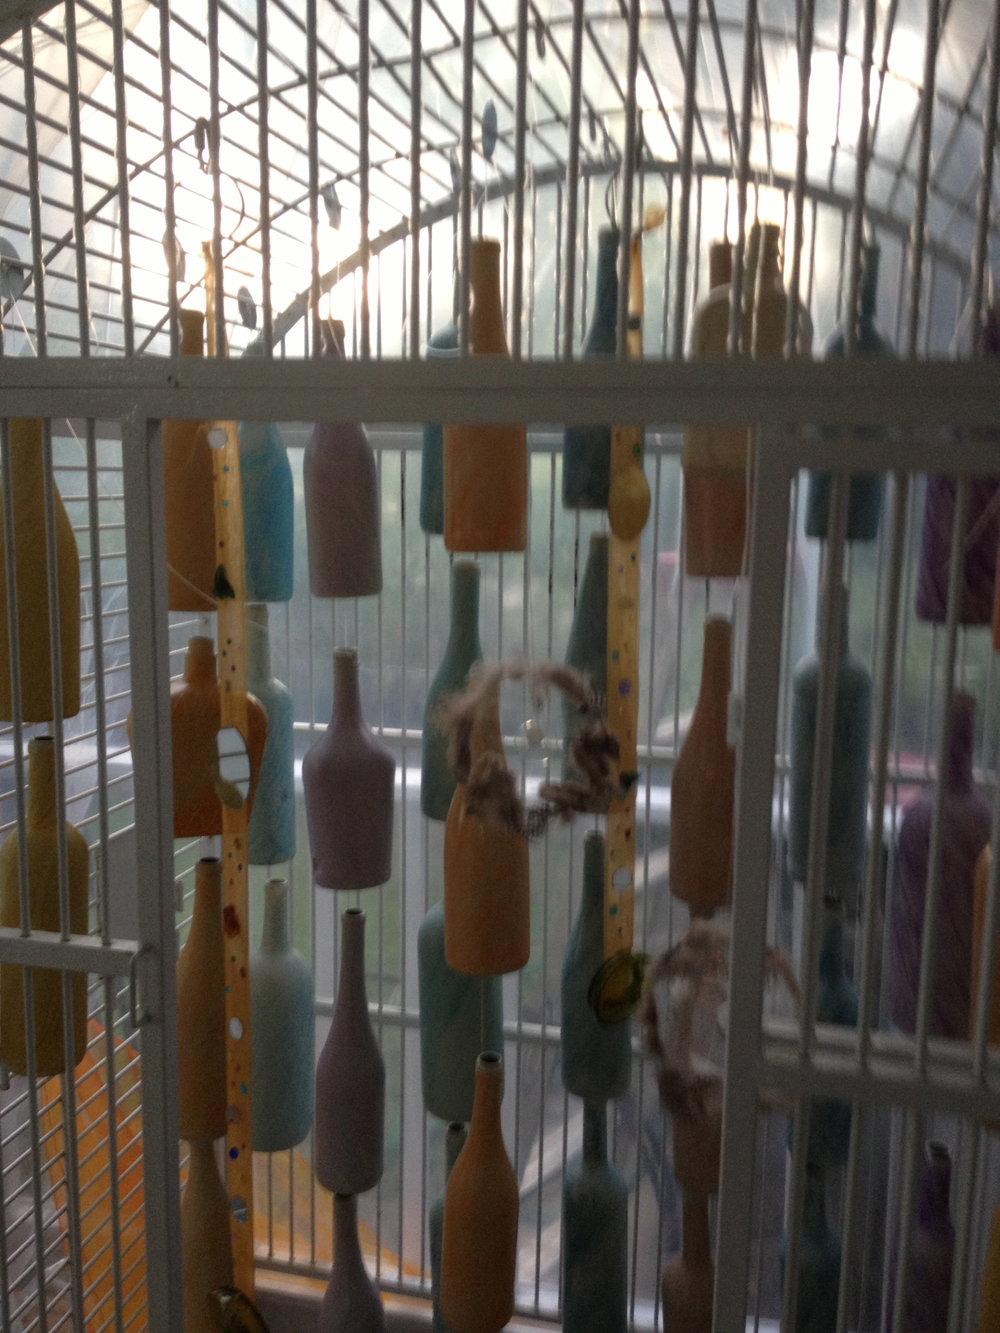 bottle cage